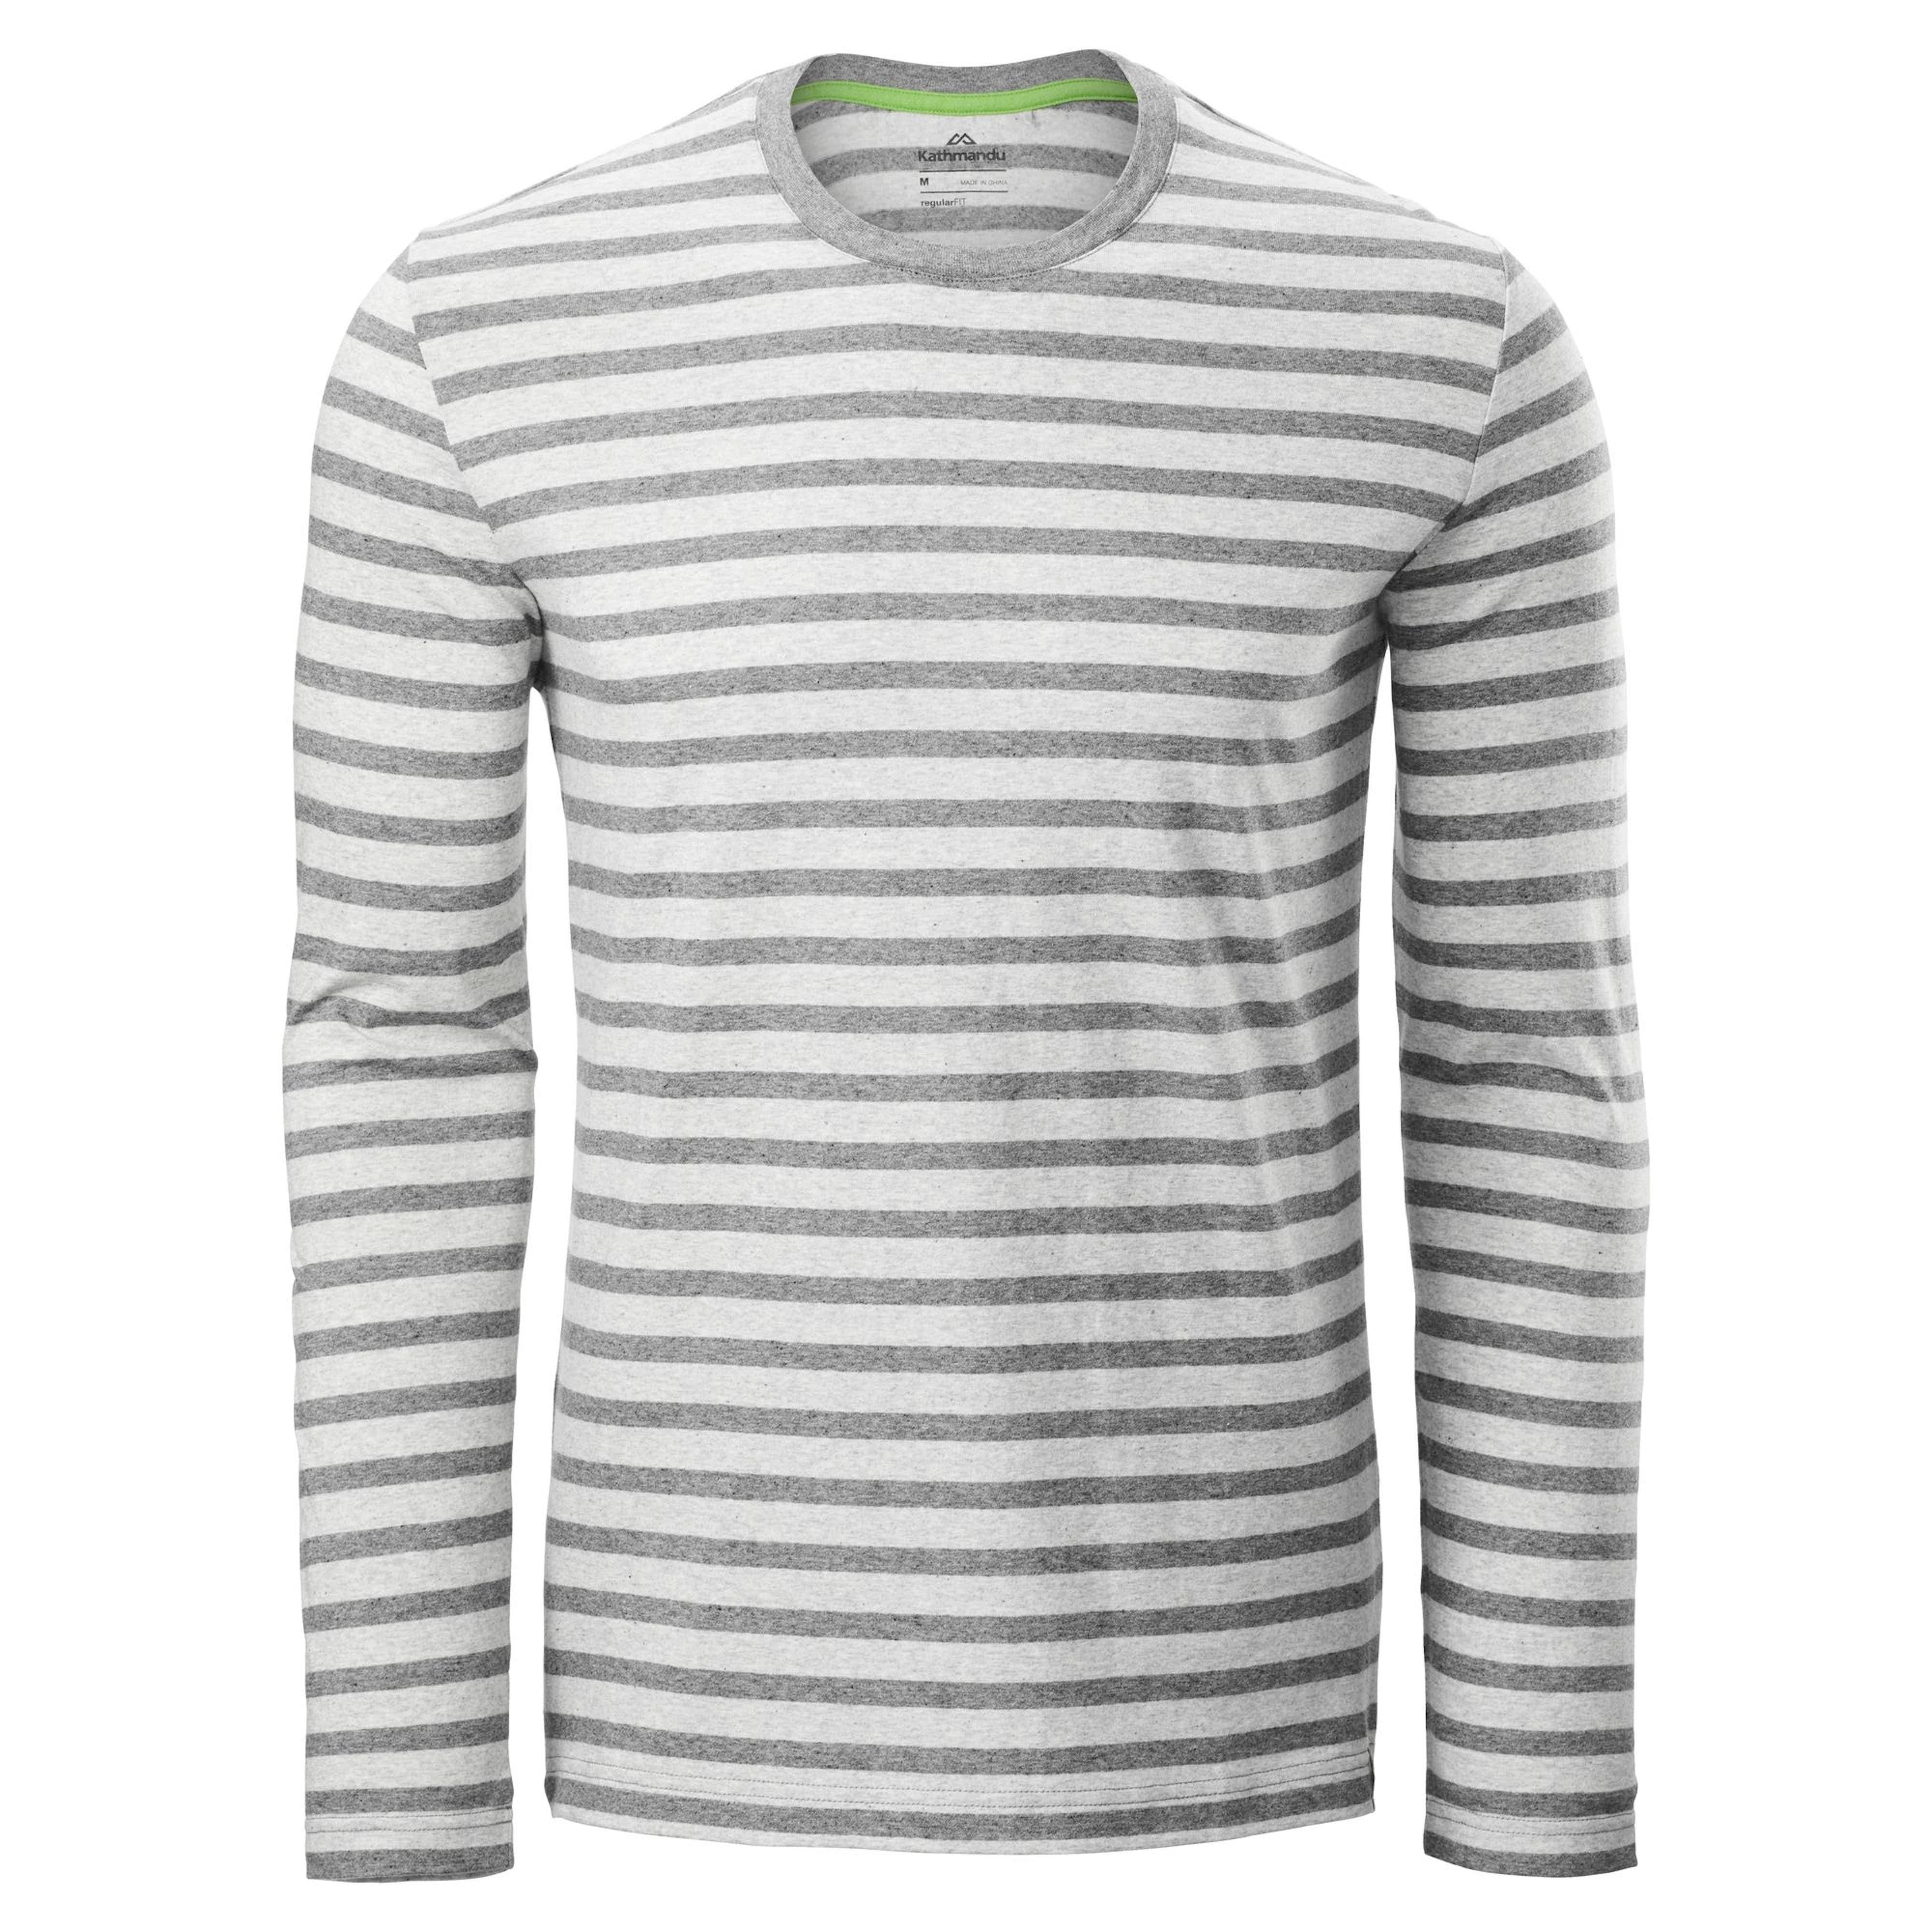 ab618c6ec7c Bengal Stripe Men s Long Sleeve T-Shirt